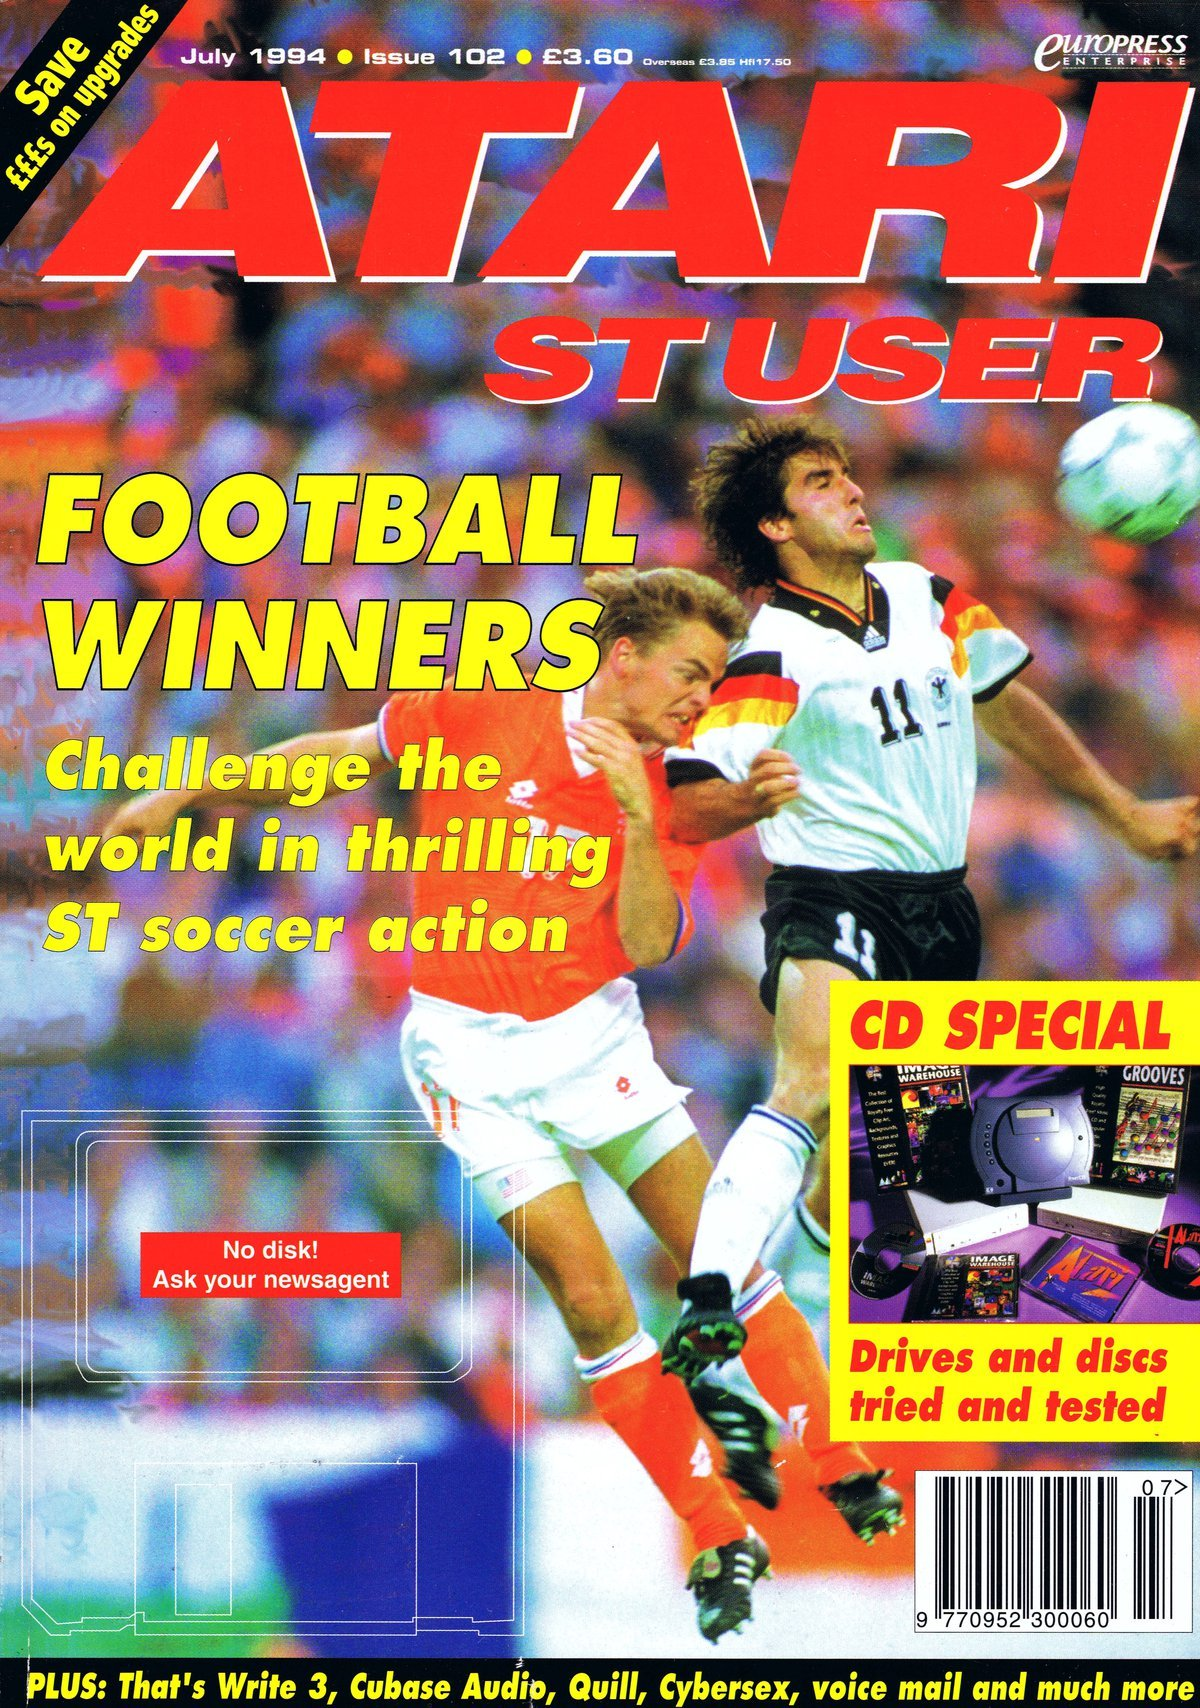 Atari ST User Issue 102 (July 1994)